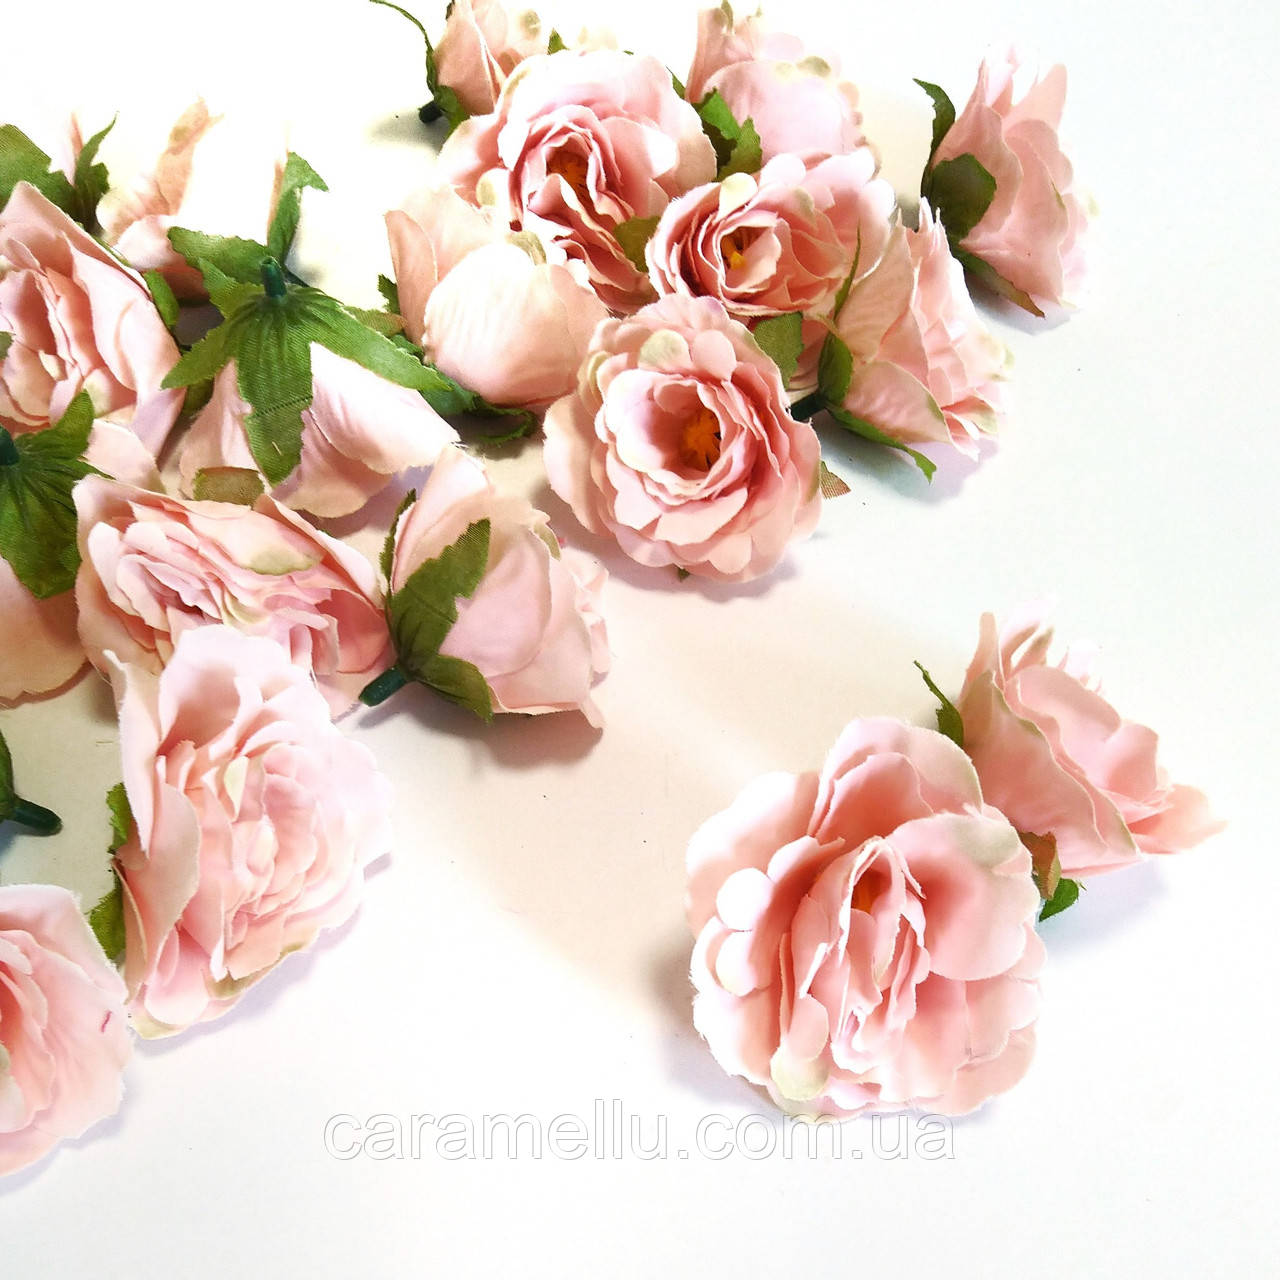 Розочка прованс. Цвет лососевого 4,5 см